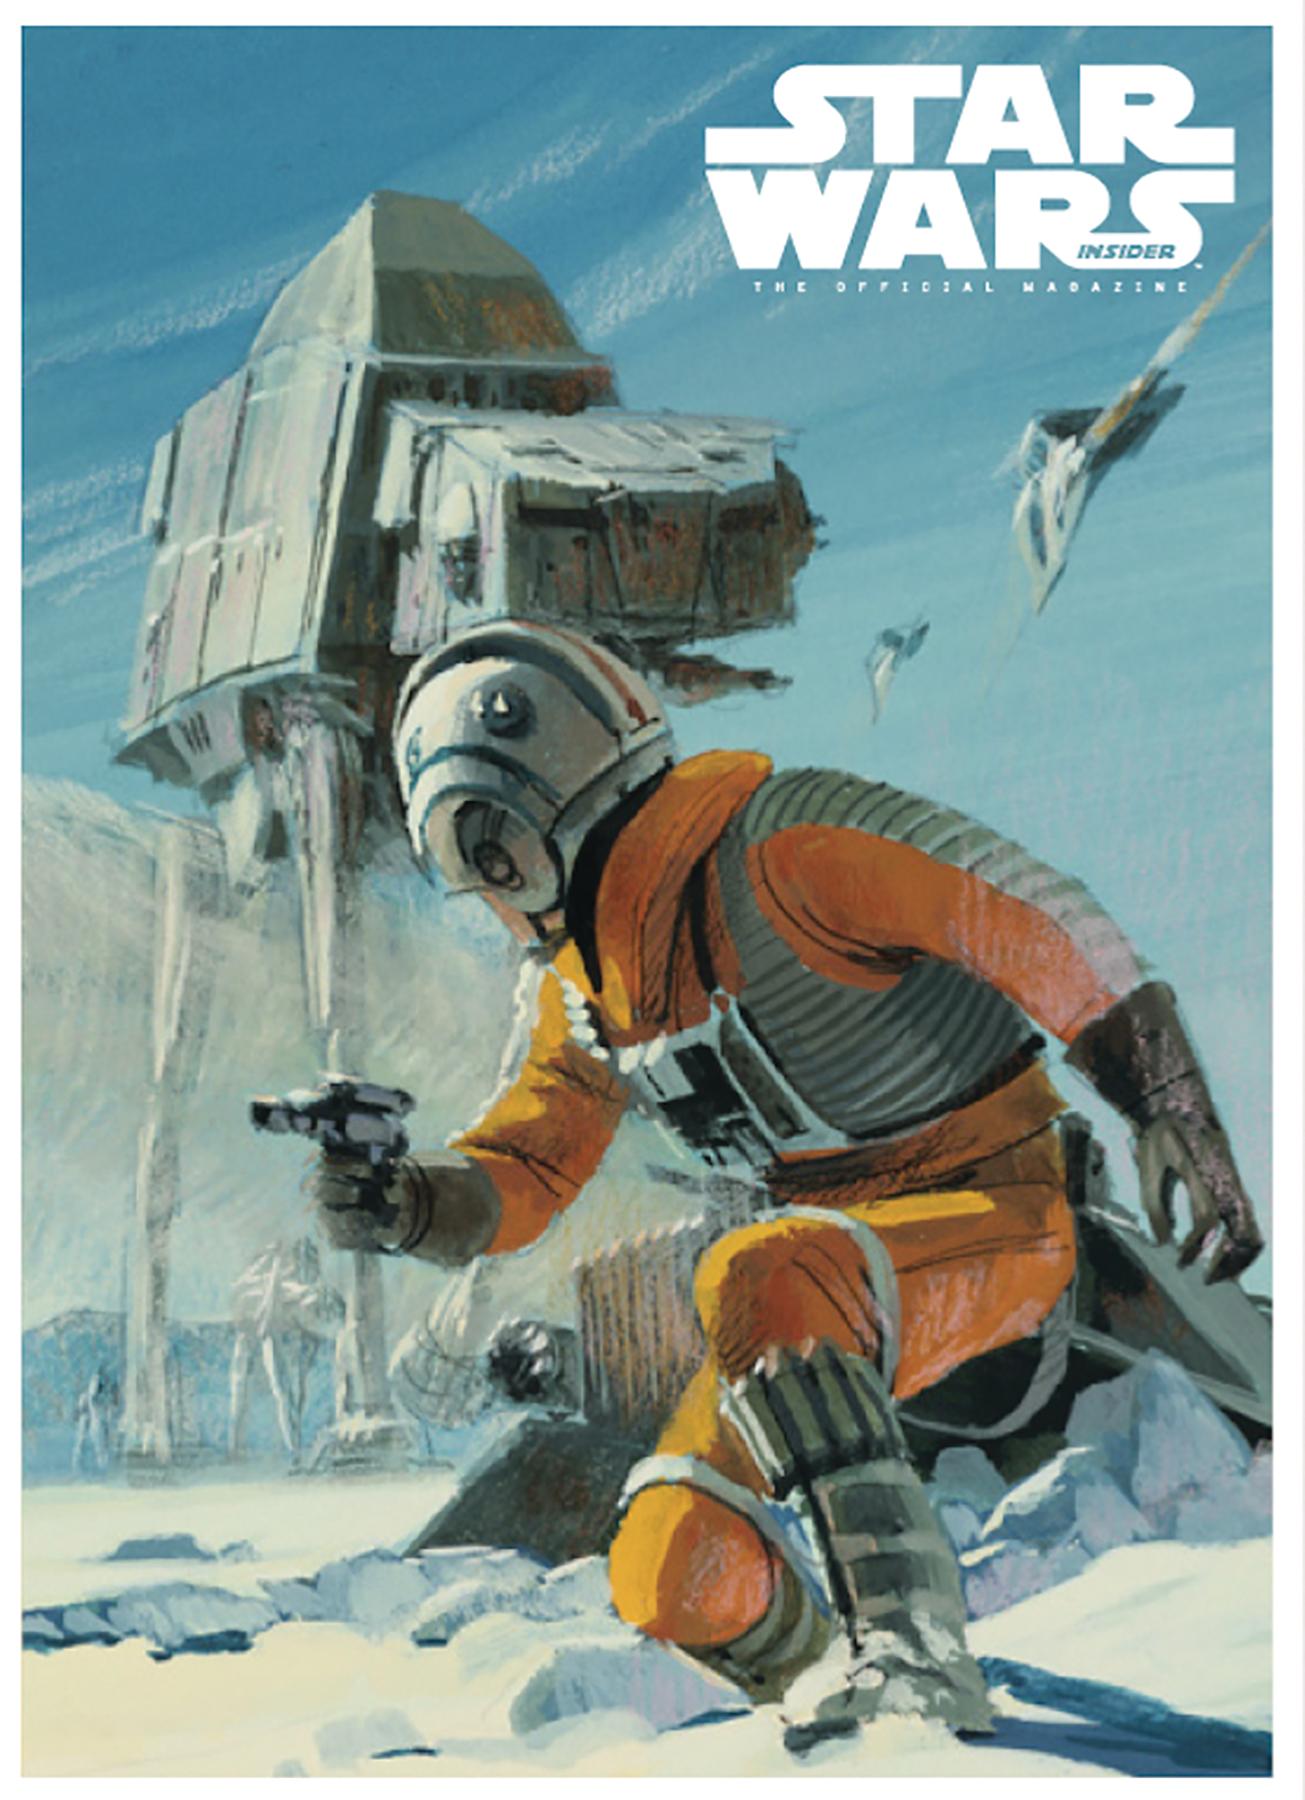 STAR WARS INSIDER #185 PX ED